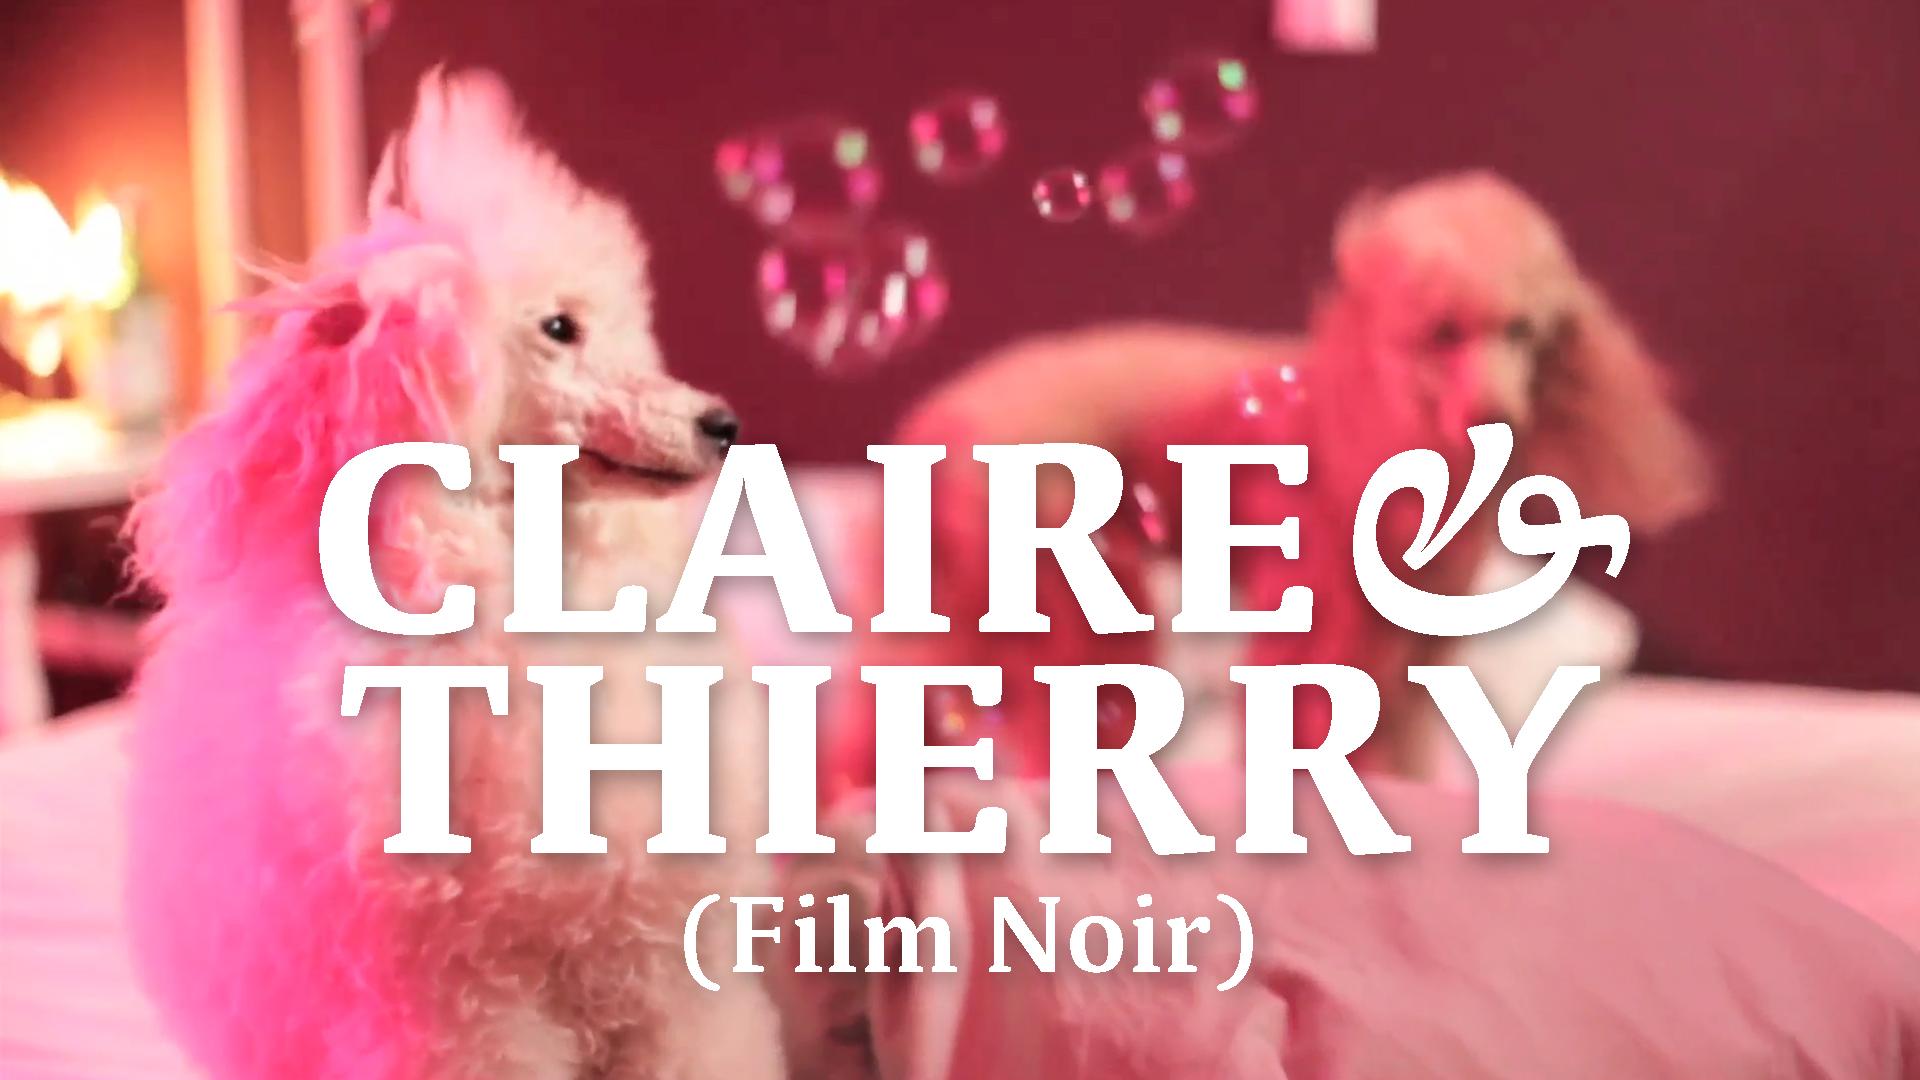 Film-Noir_04a_ClaireThierry